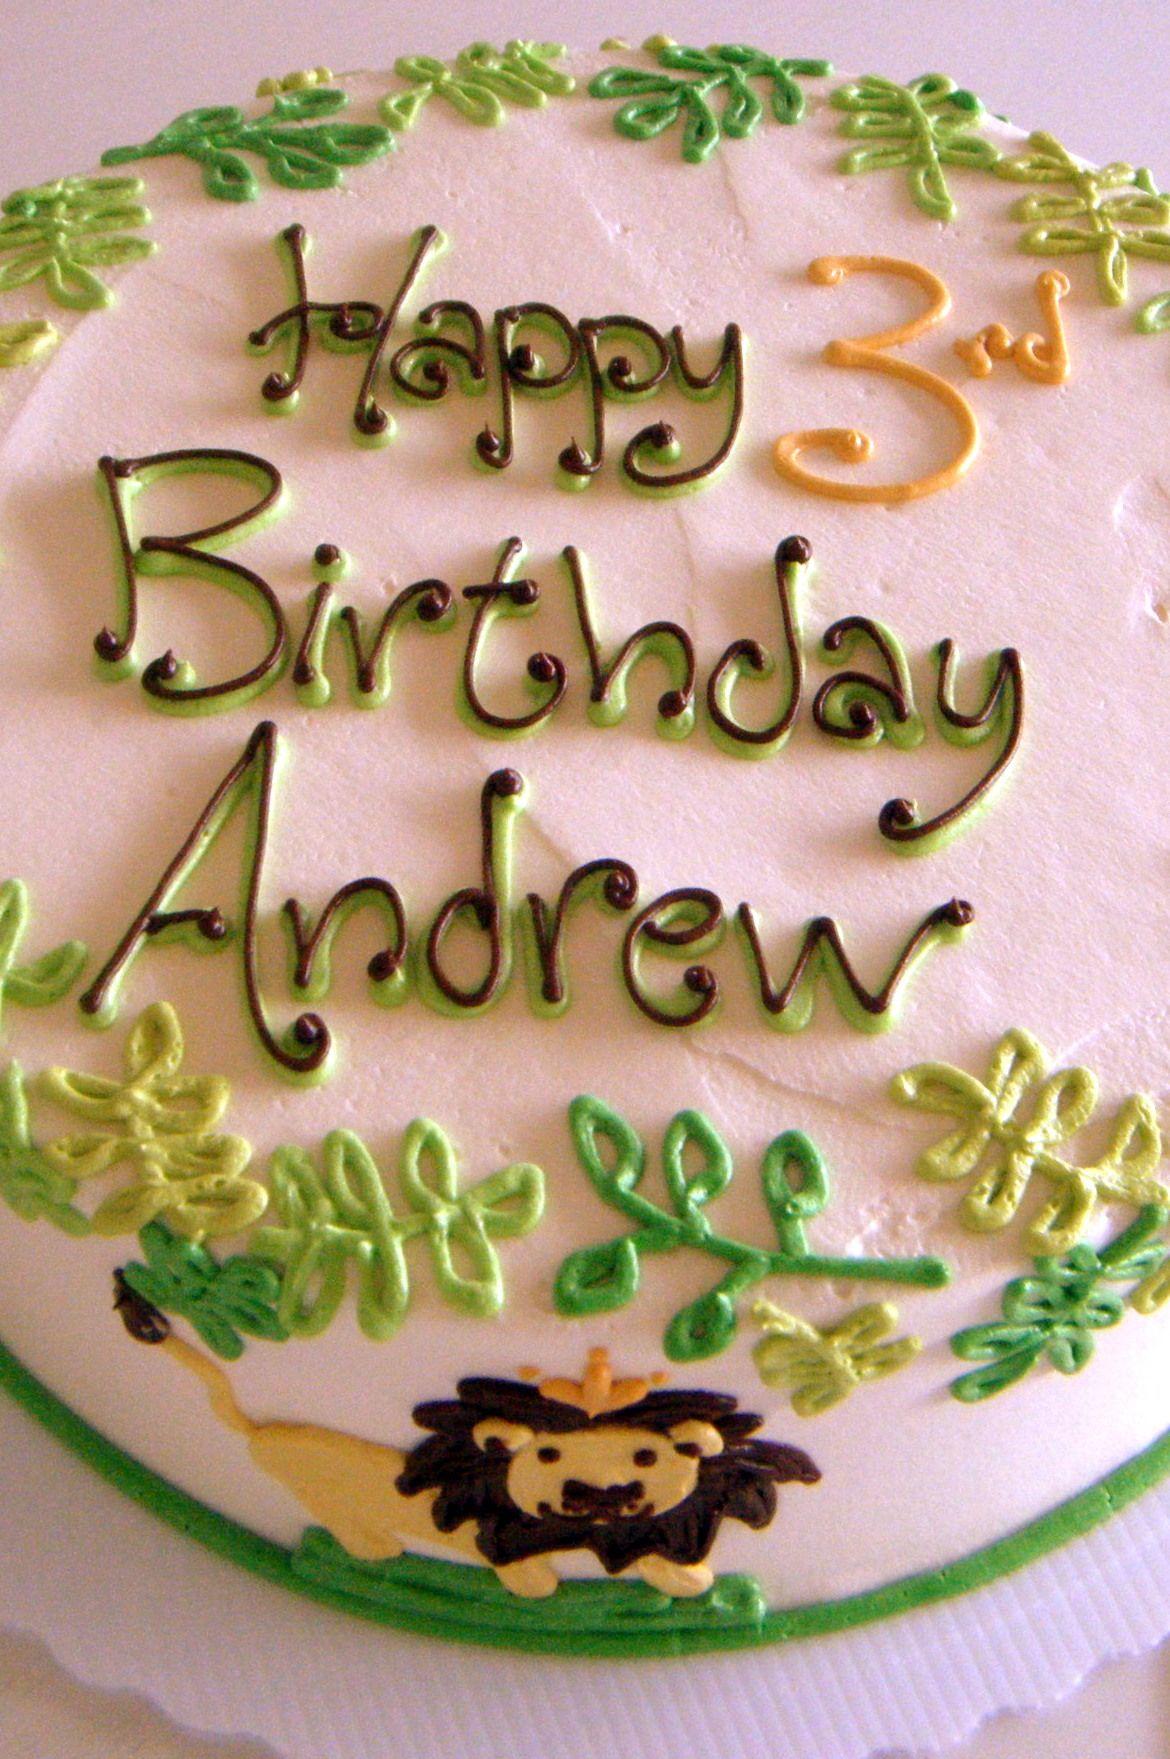 Superb Maxie Bs Bakery Greensboro Nc Childrens Birthday Cakes Cake Personalised Birthday Cards Paralily Jamesorg